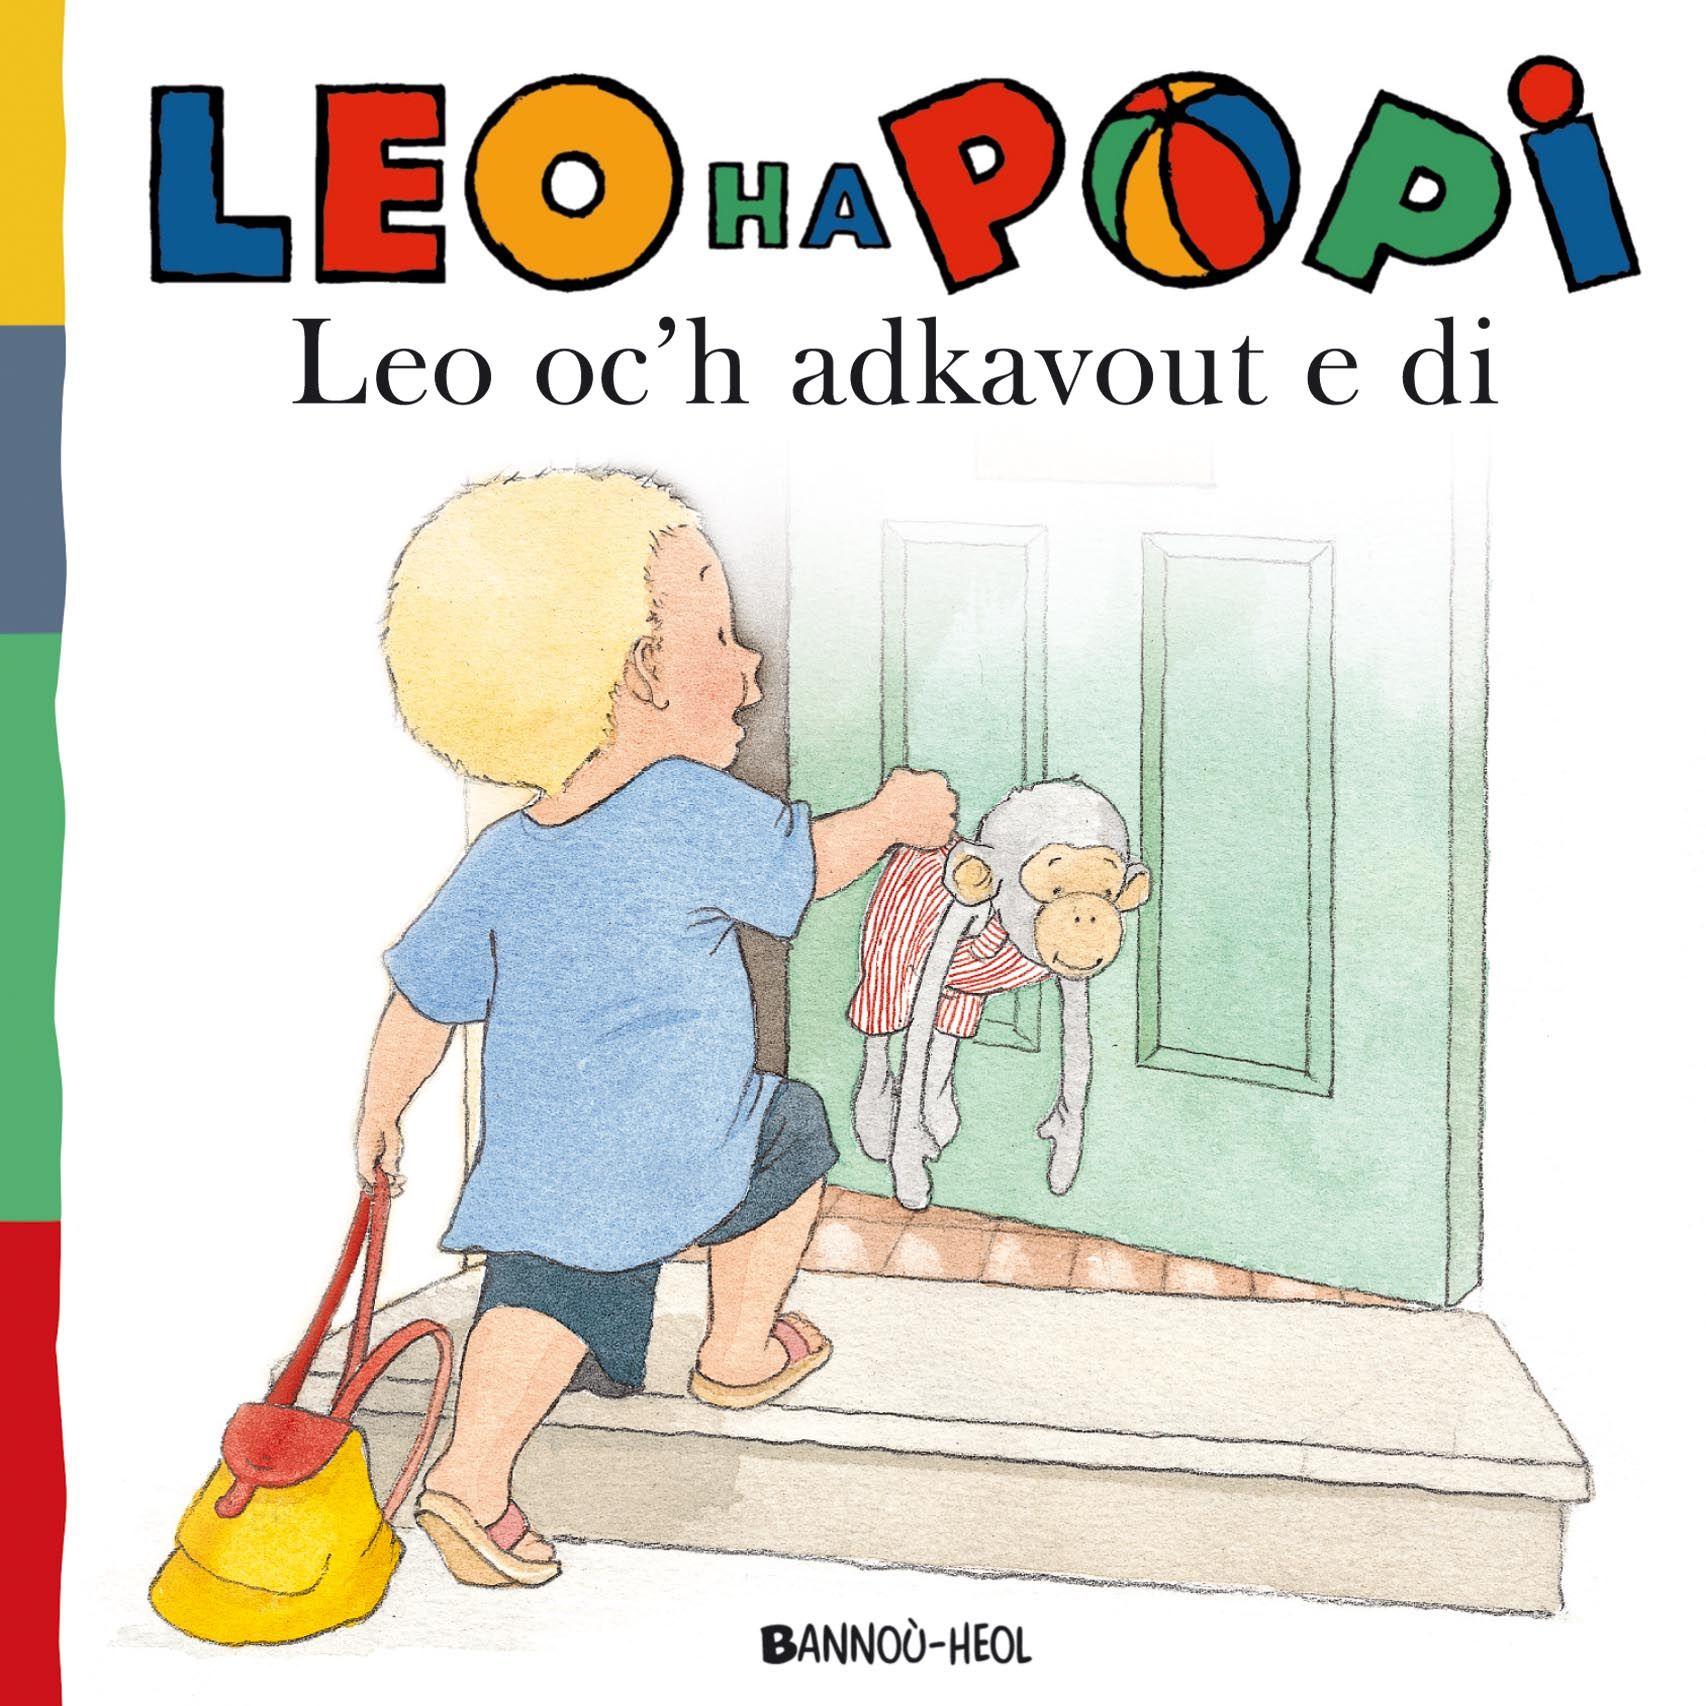 Léo retrouve sa maison